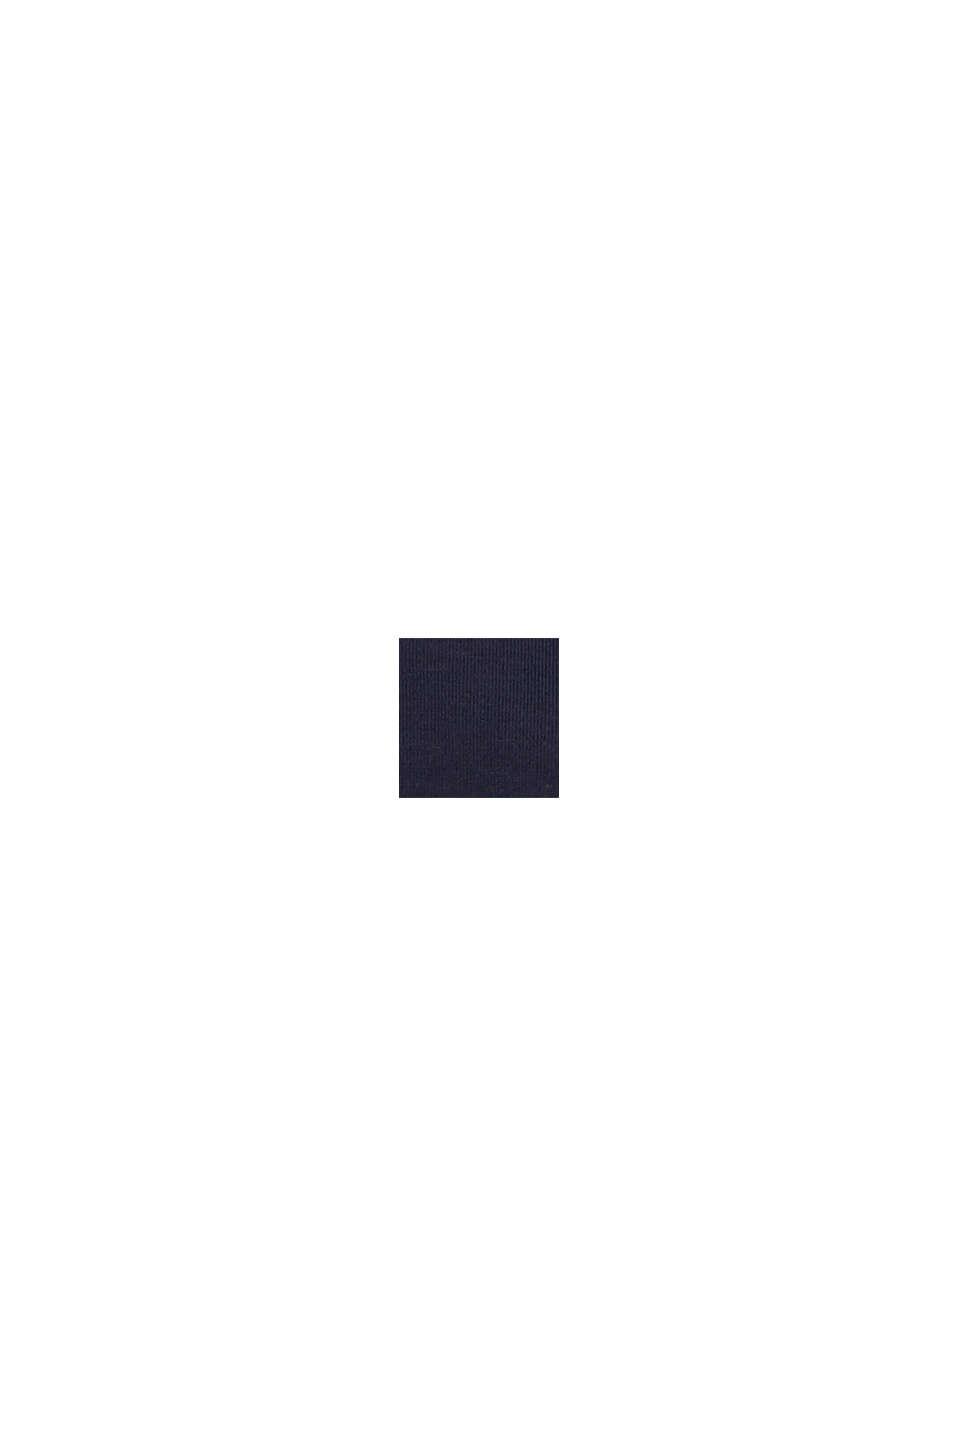 Ze 100% vlny merino: svetr s kulatým výstřihem, NAVY, swatch